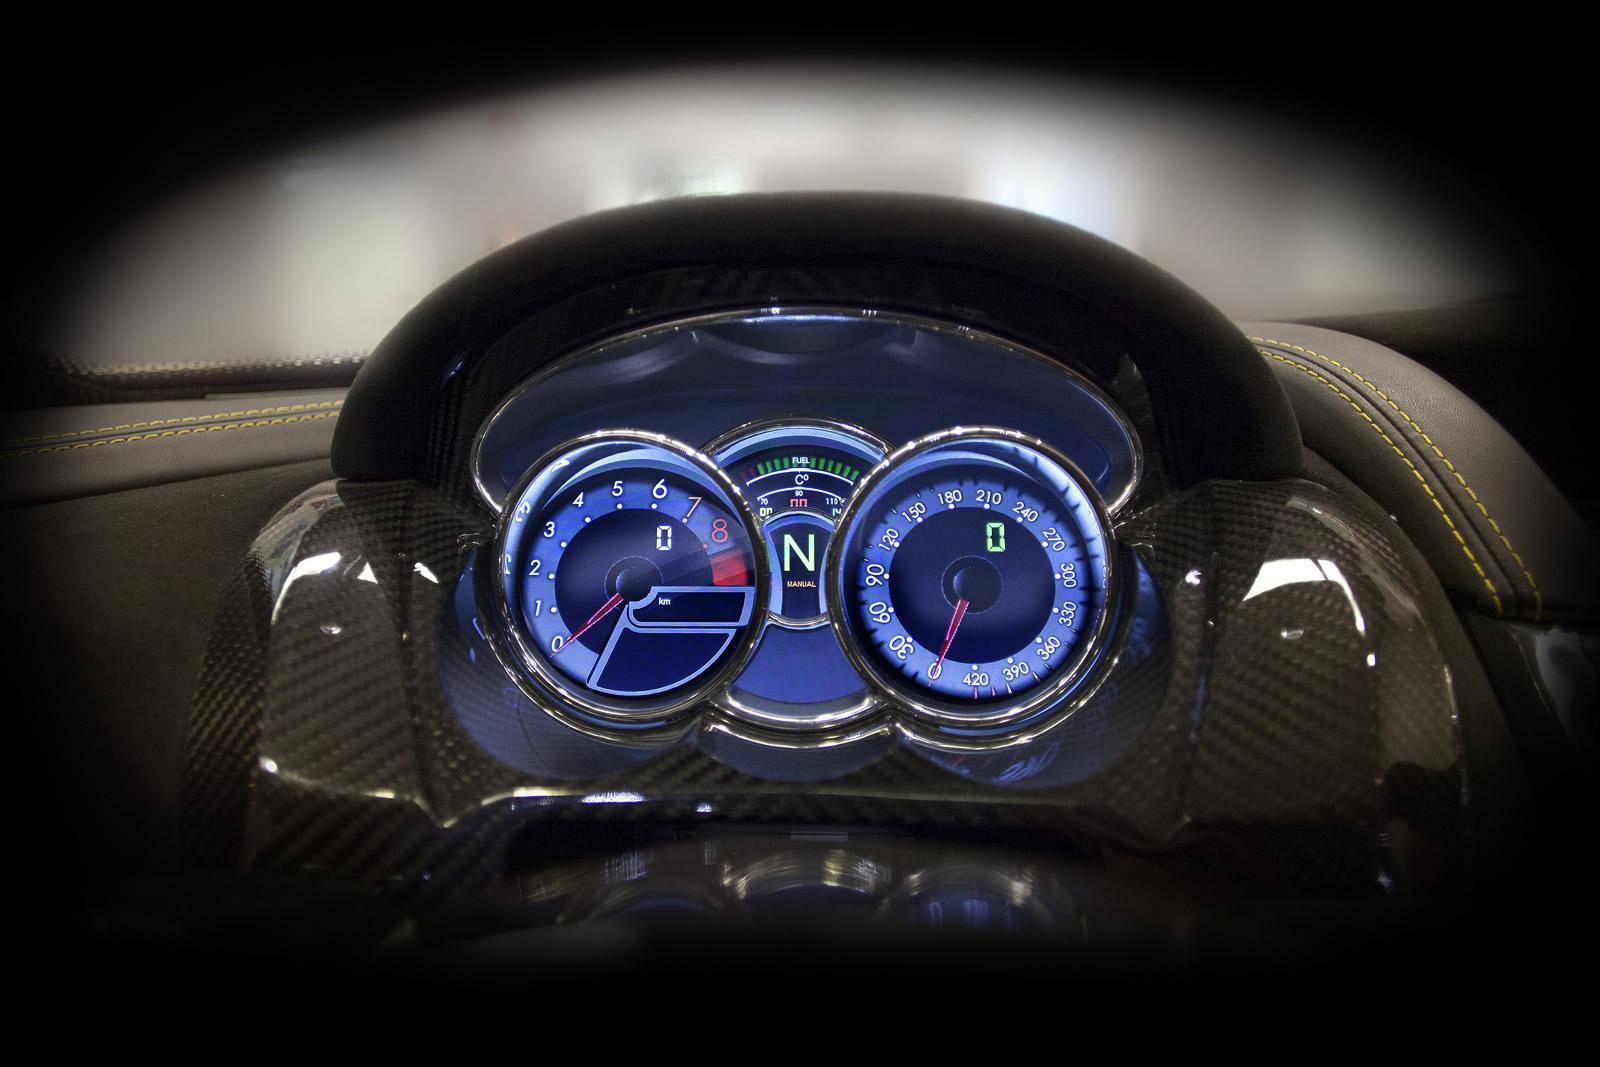 Суперкар GTA Spano – дитя Валенсии   Автомобиль как